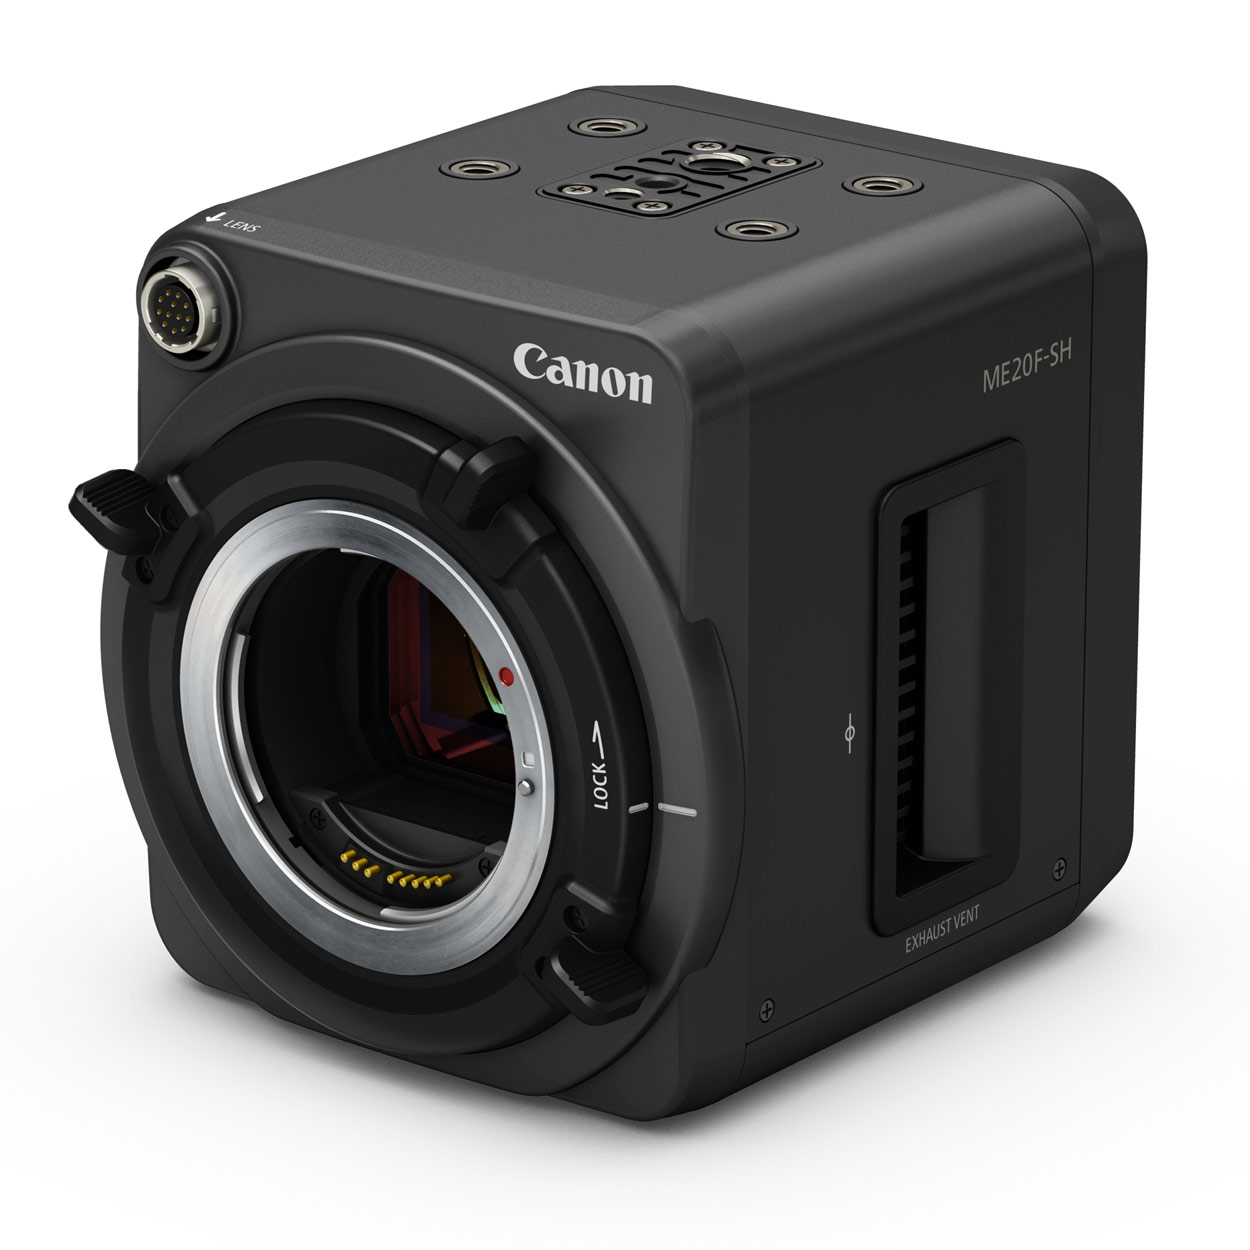 Canon-me20fsh-lowlight-camera-2  sc 1 st  cinema5D & The New Canon ME20F-SH - A Lowlight Camera with 4 Million ISO! azcodes.com